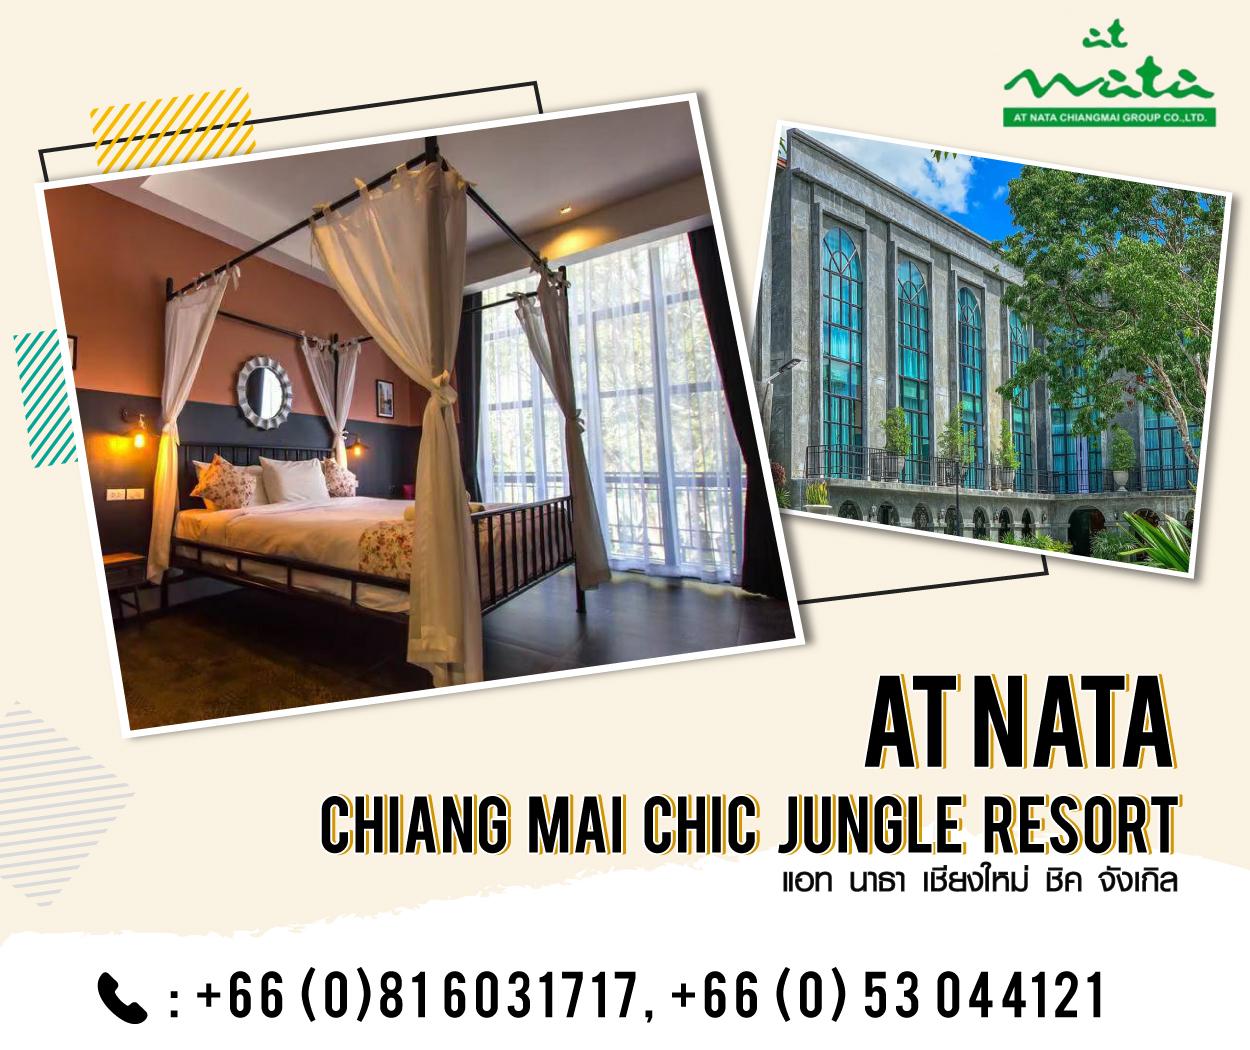 At Nata Chiangmai Chic Jungle Resort